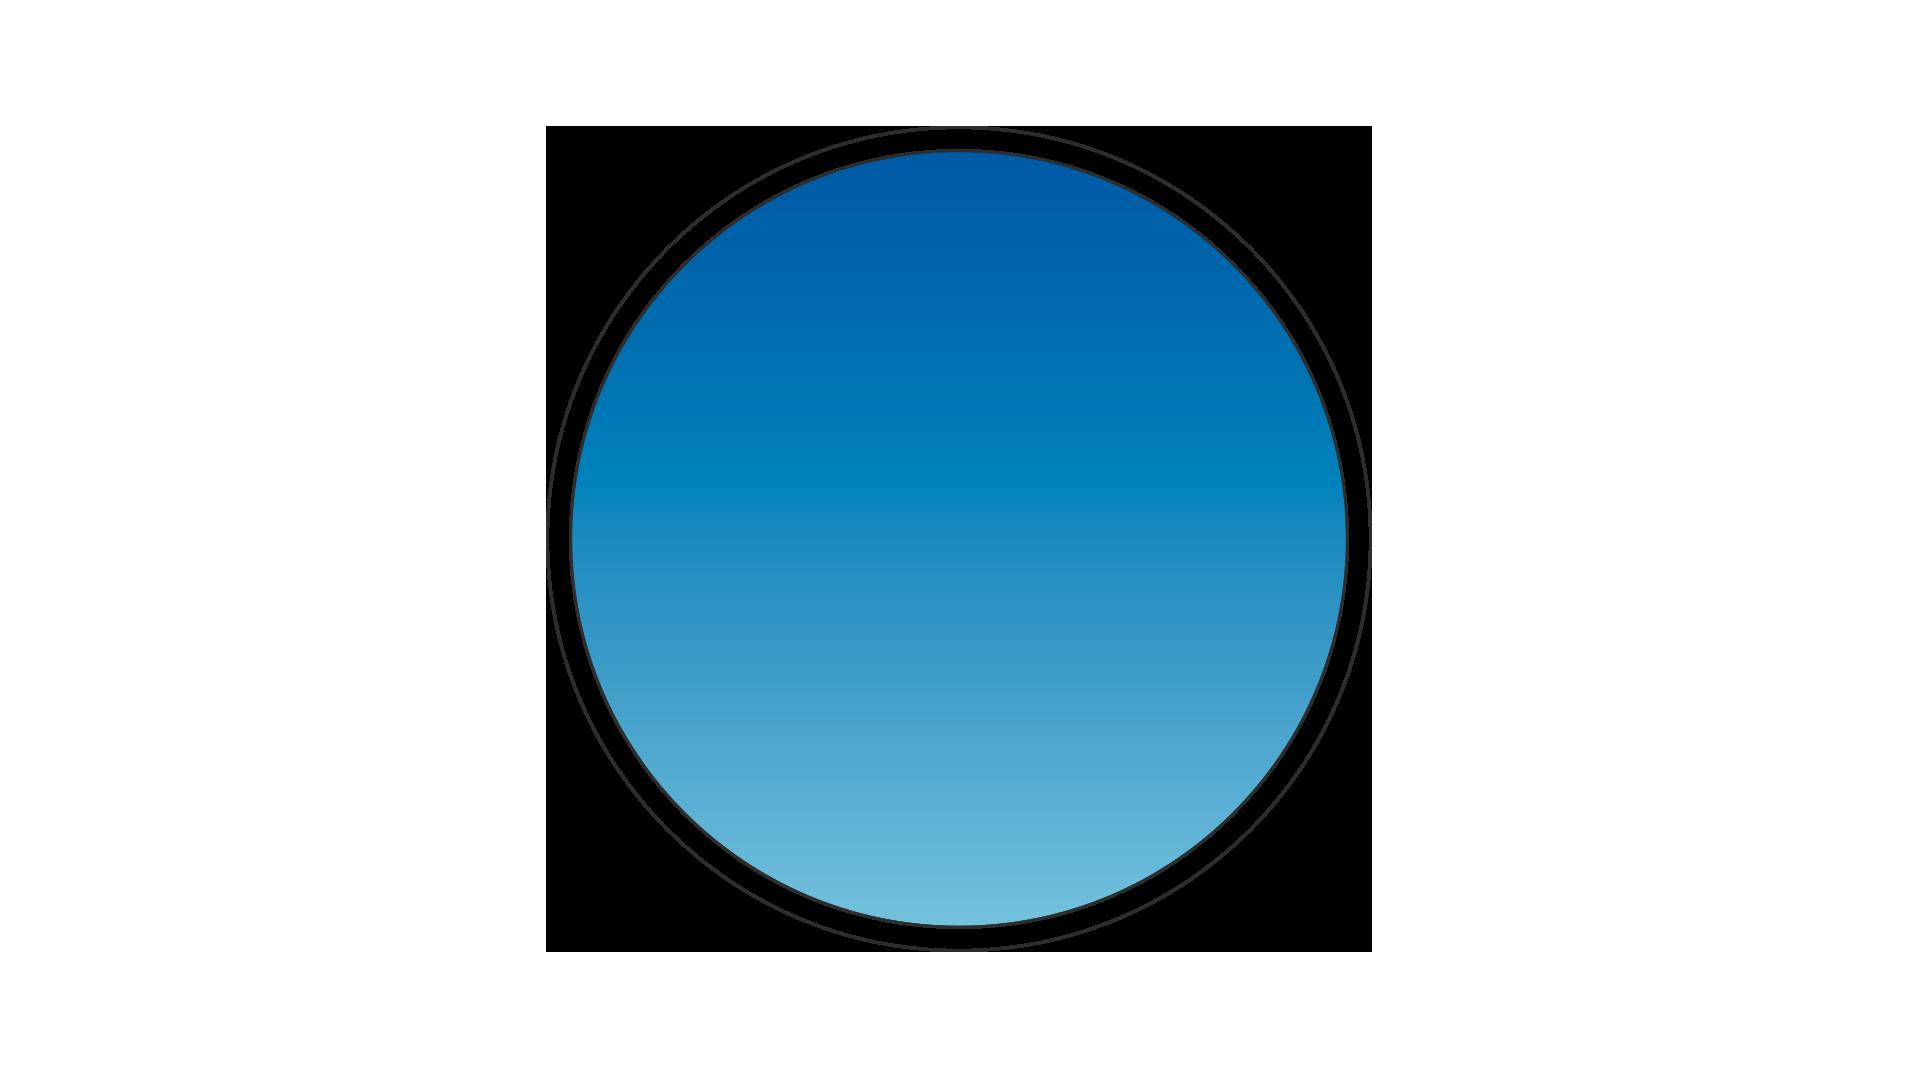 Access-Optic-Verre-Degrade